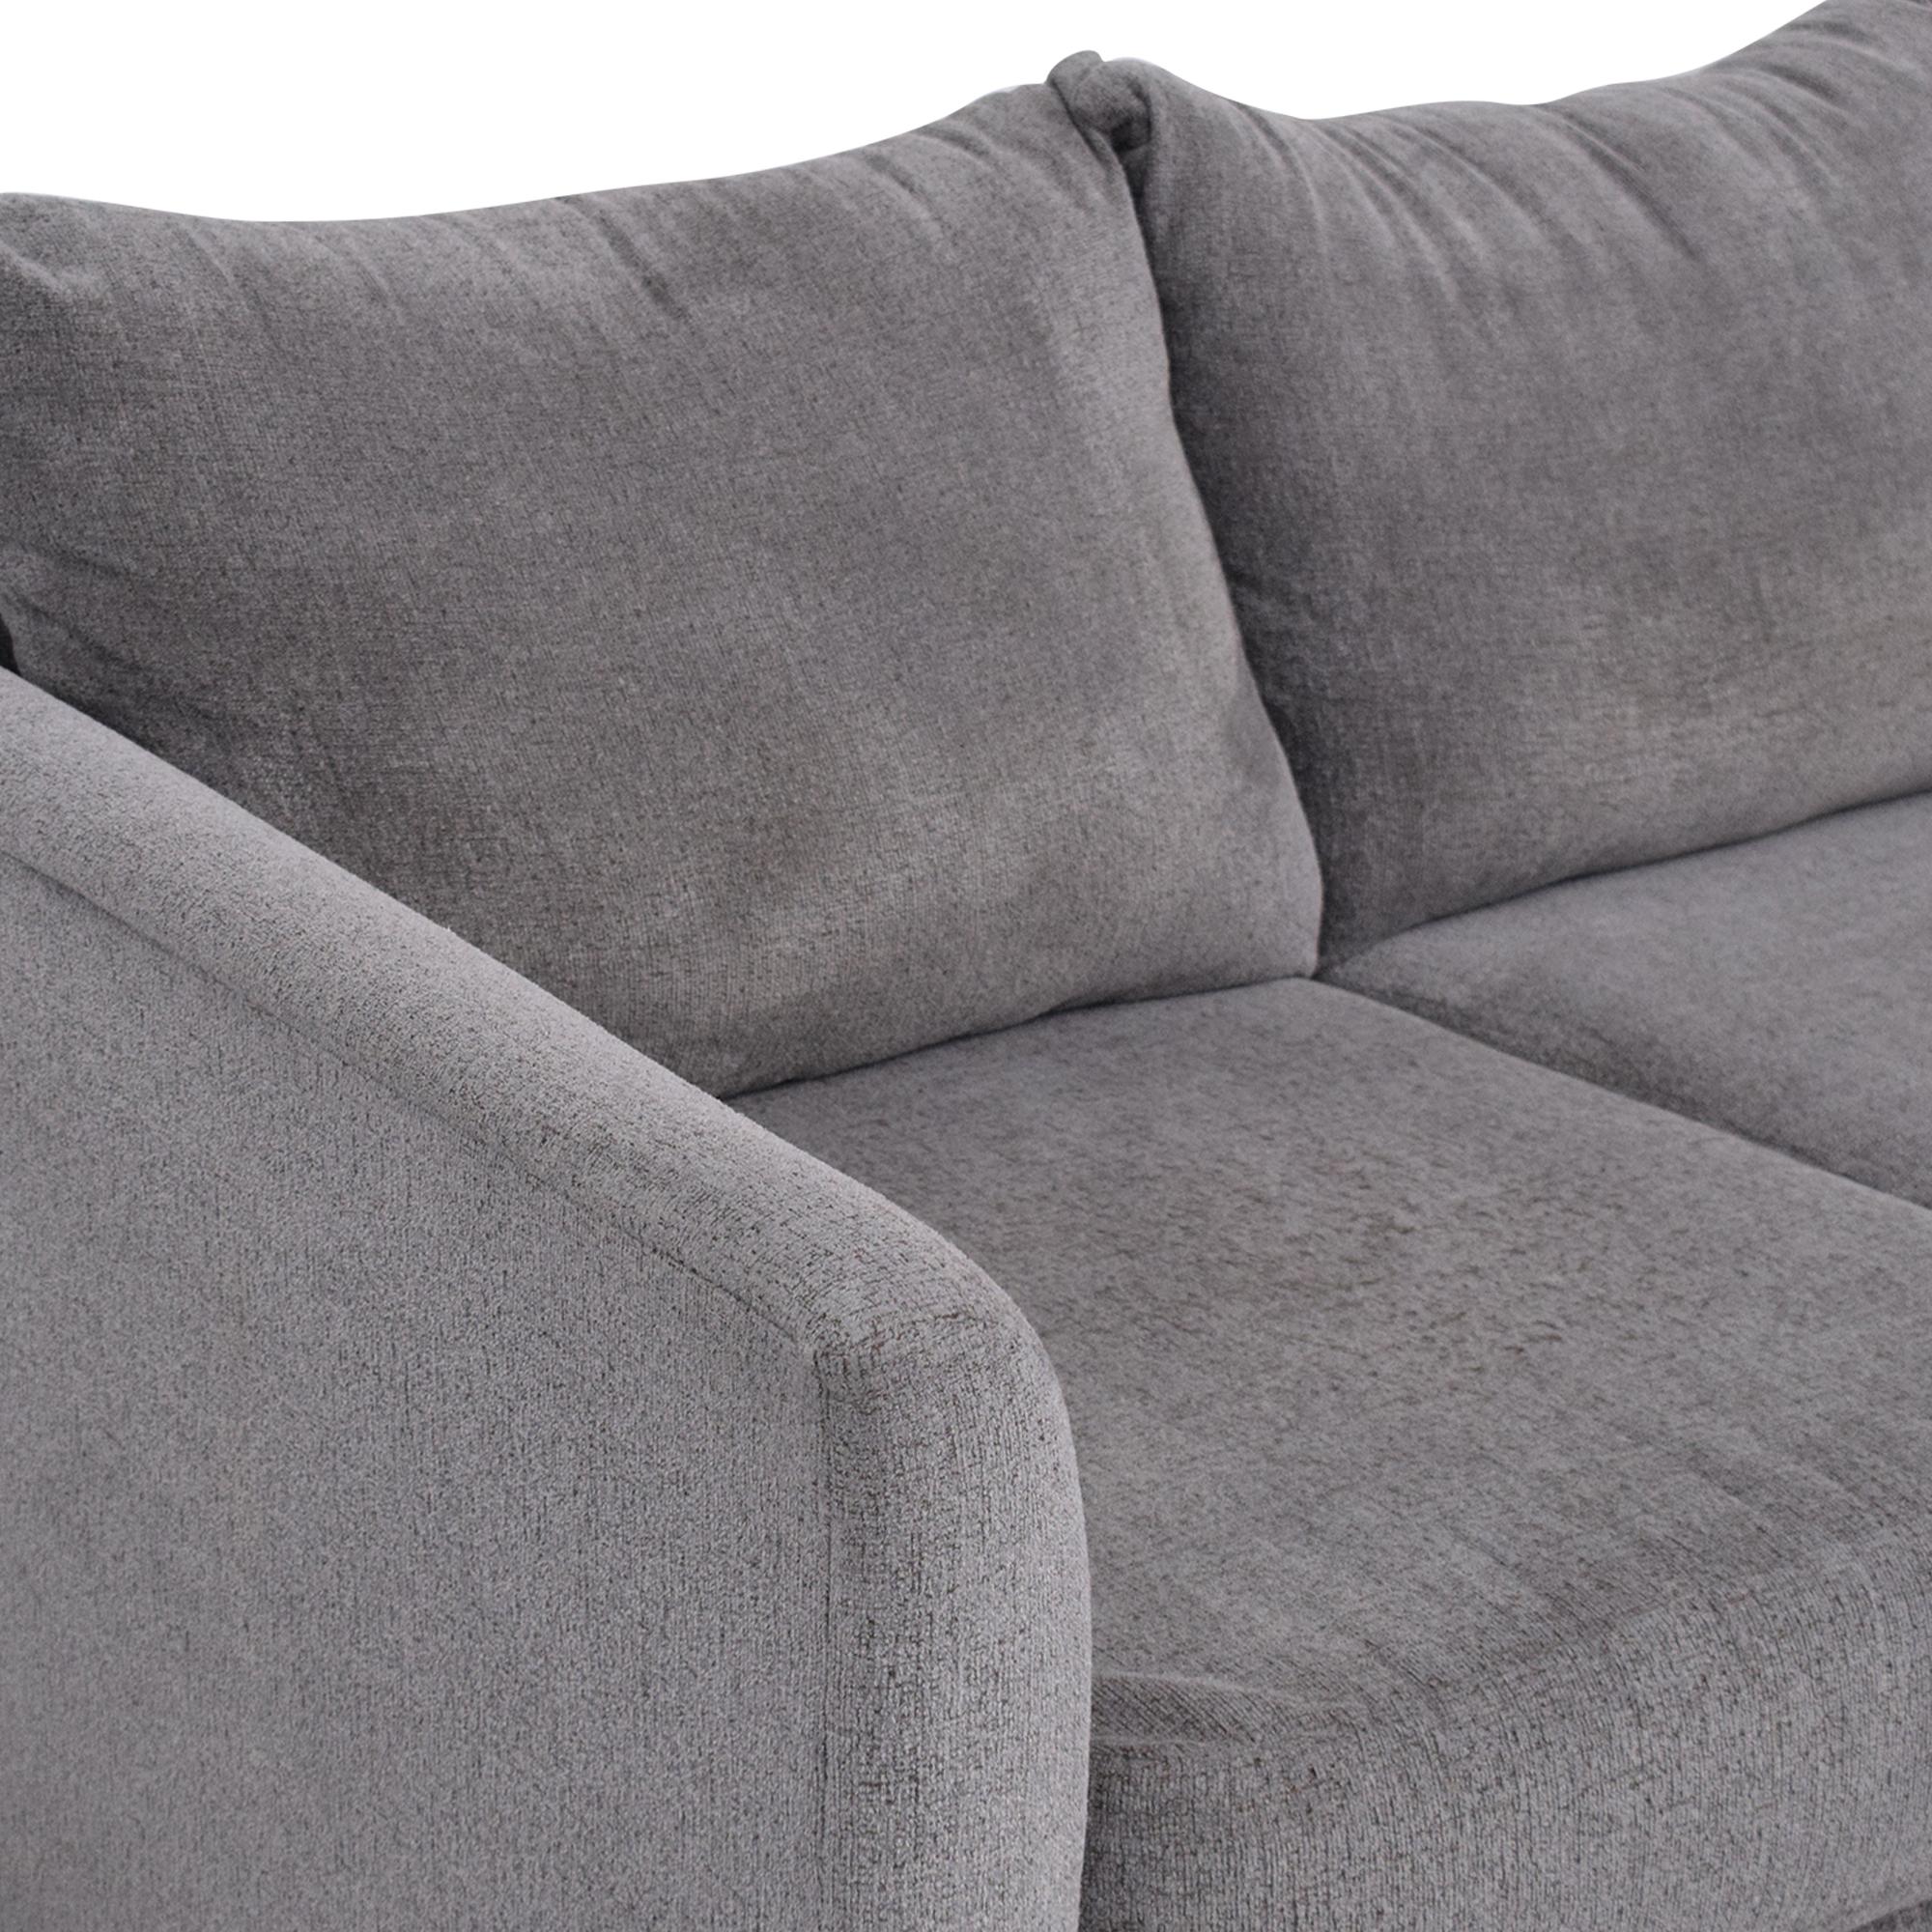 KFI Sectional Chaise Sofa KFI